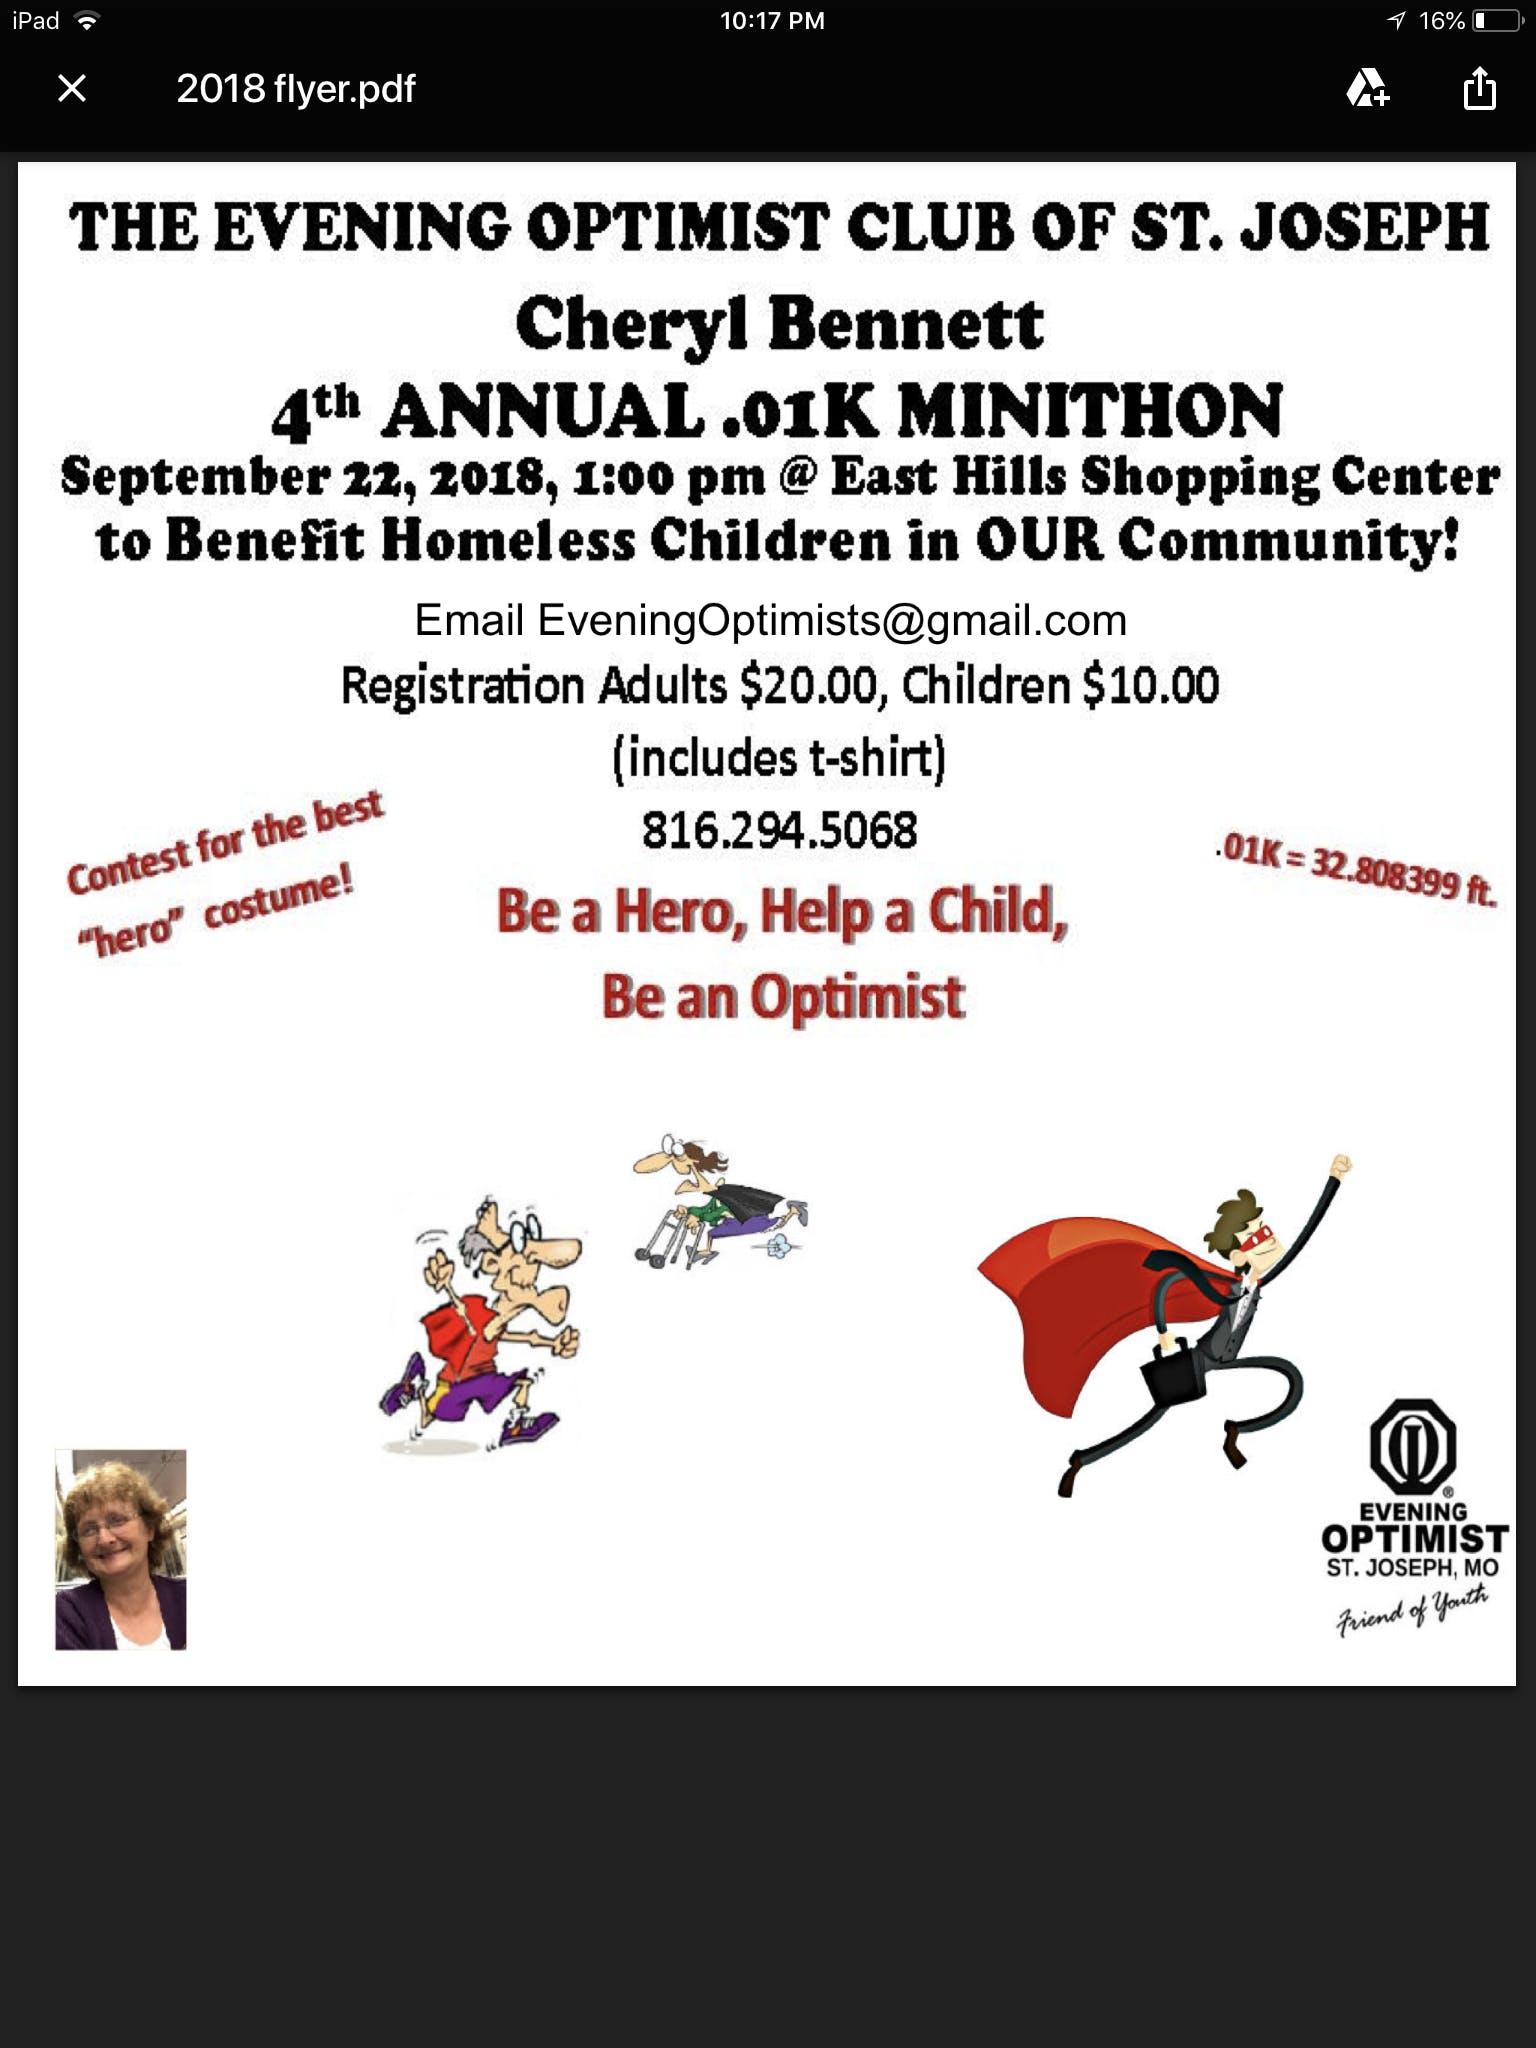 The 4th Annual Cheryl Bennett .01k Minithon!